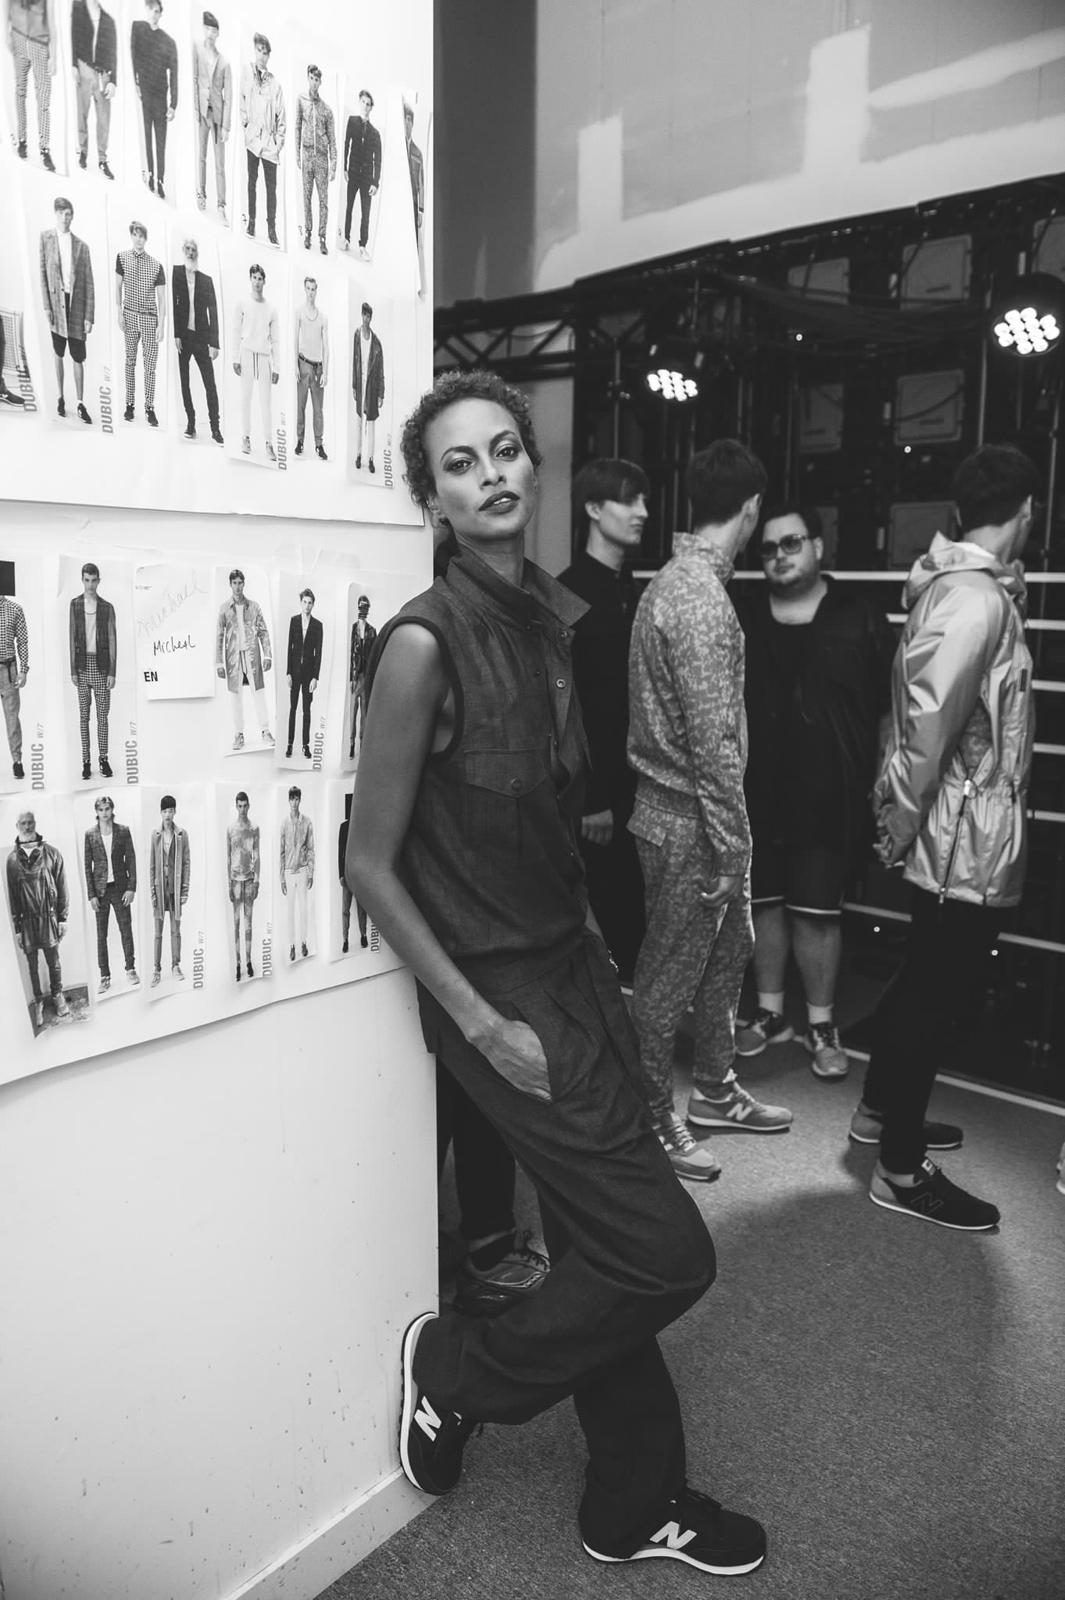 Yasmin_Warsame_backstage_Phillipe_Dubuc_photo_Brian_de_Rivera_Simon-TOM_FW-SS16